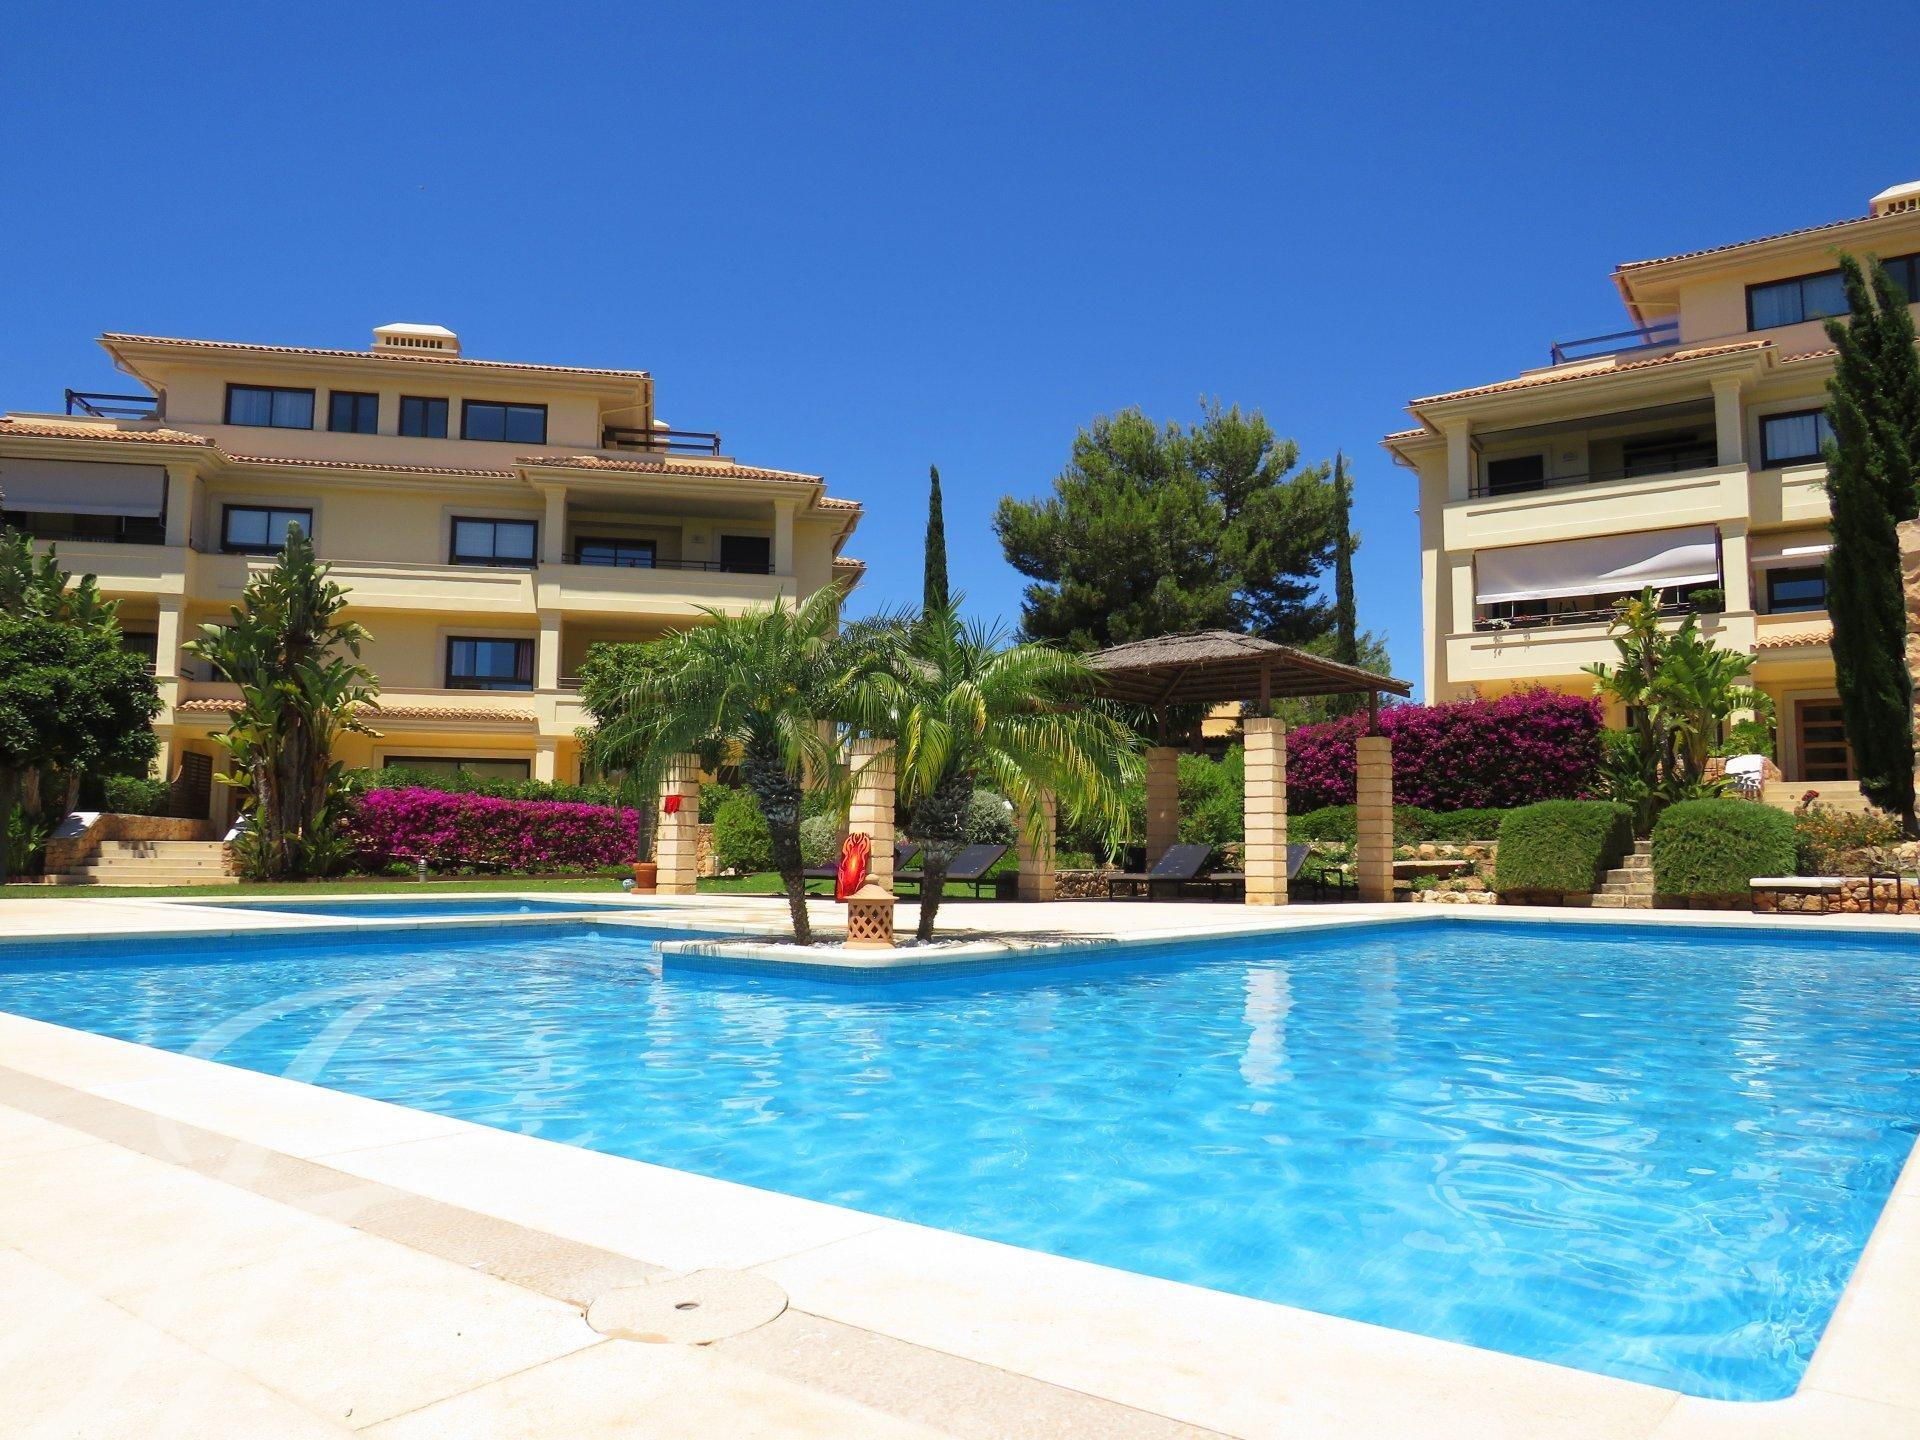 Ad Sale Apartment Santa Ponsa (07180) ref:V0343SP